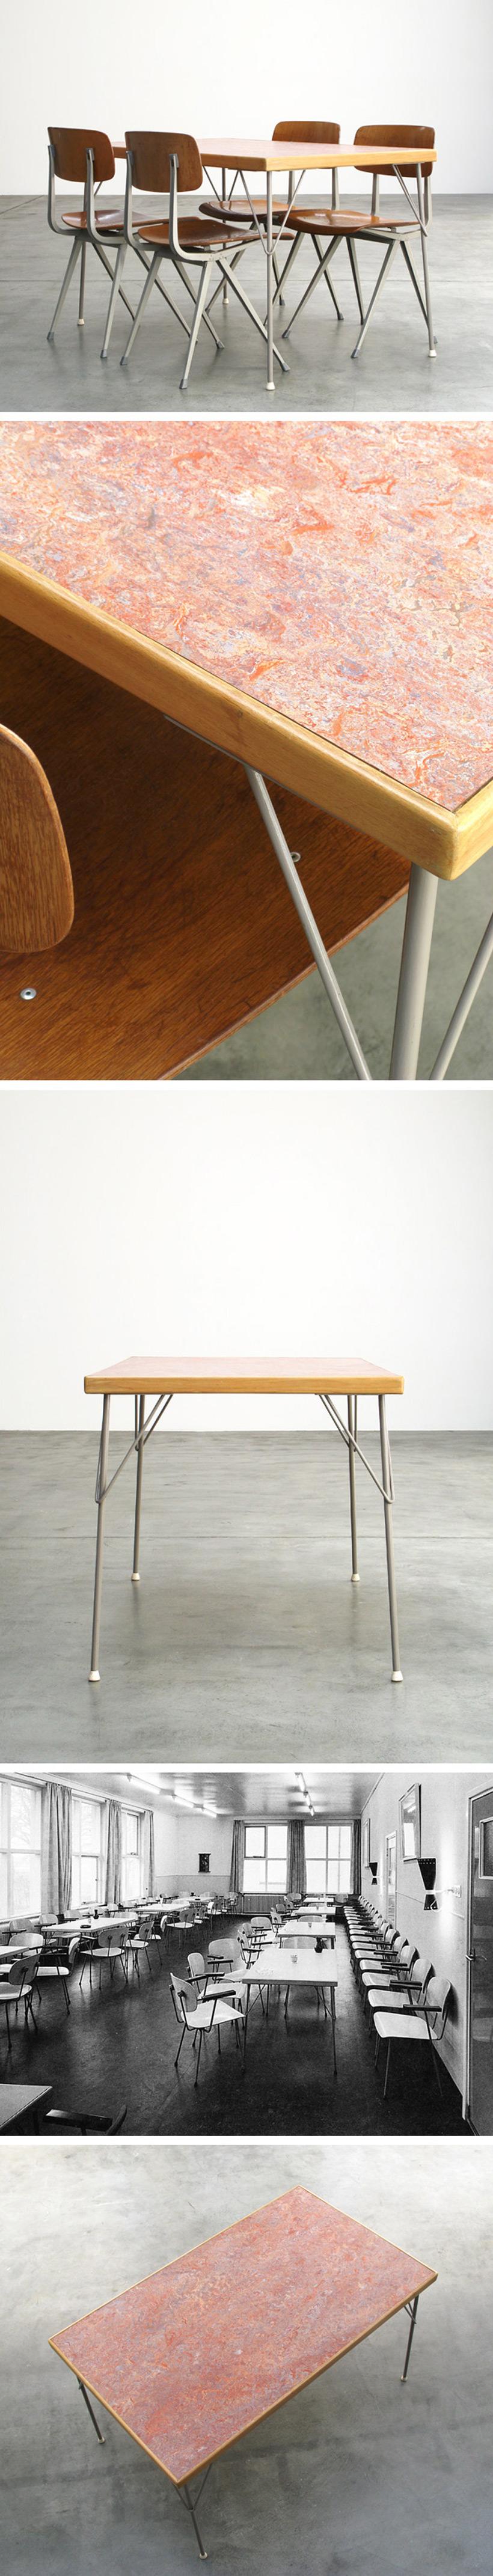 Wim Rietveld industrial dinning table Gispen Large